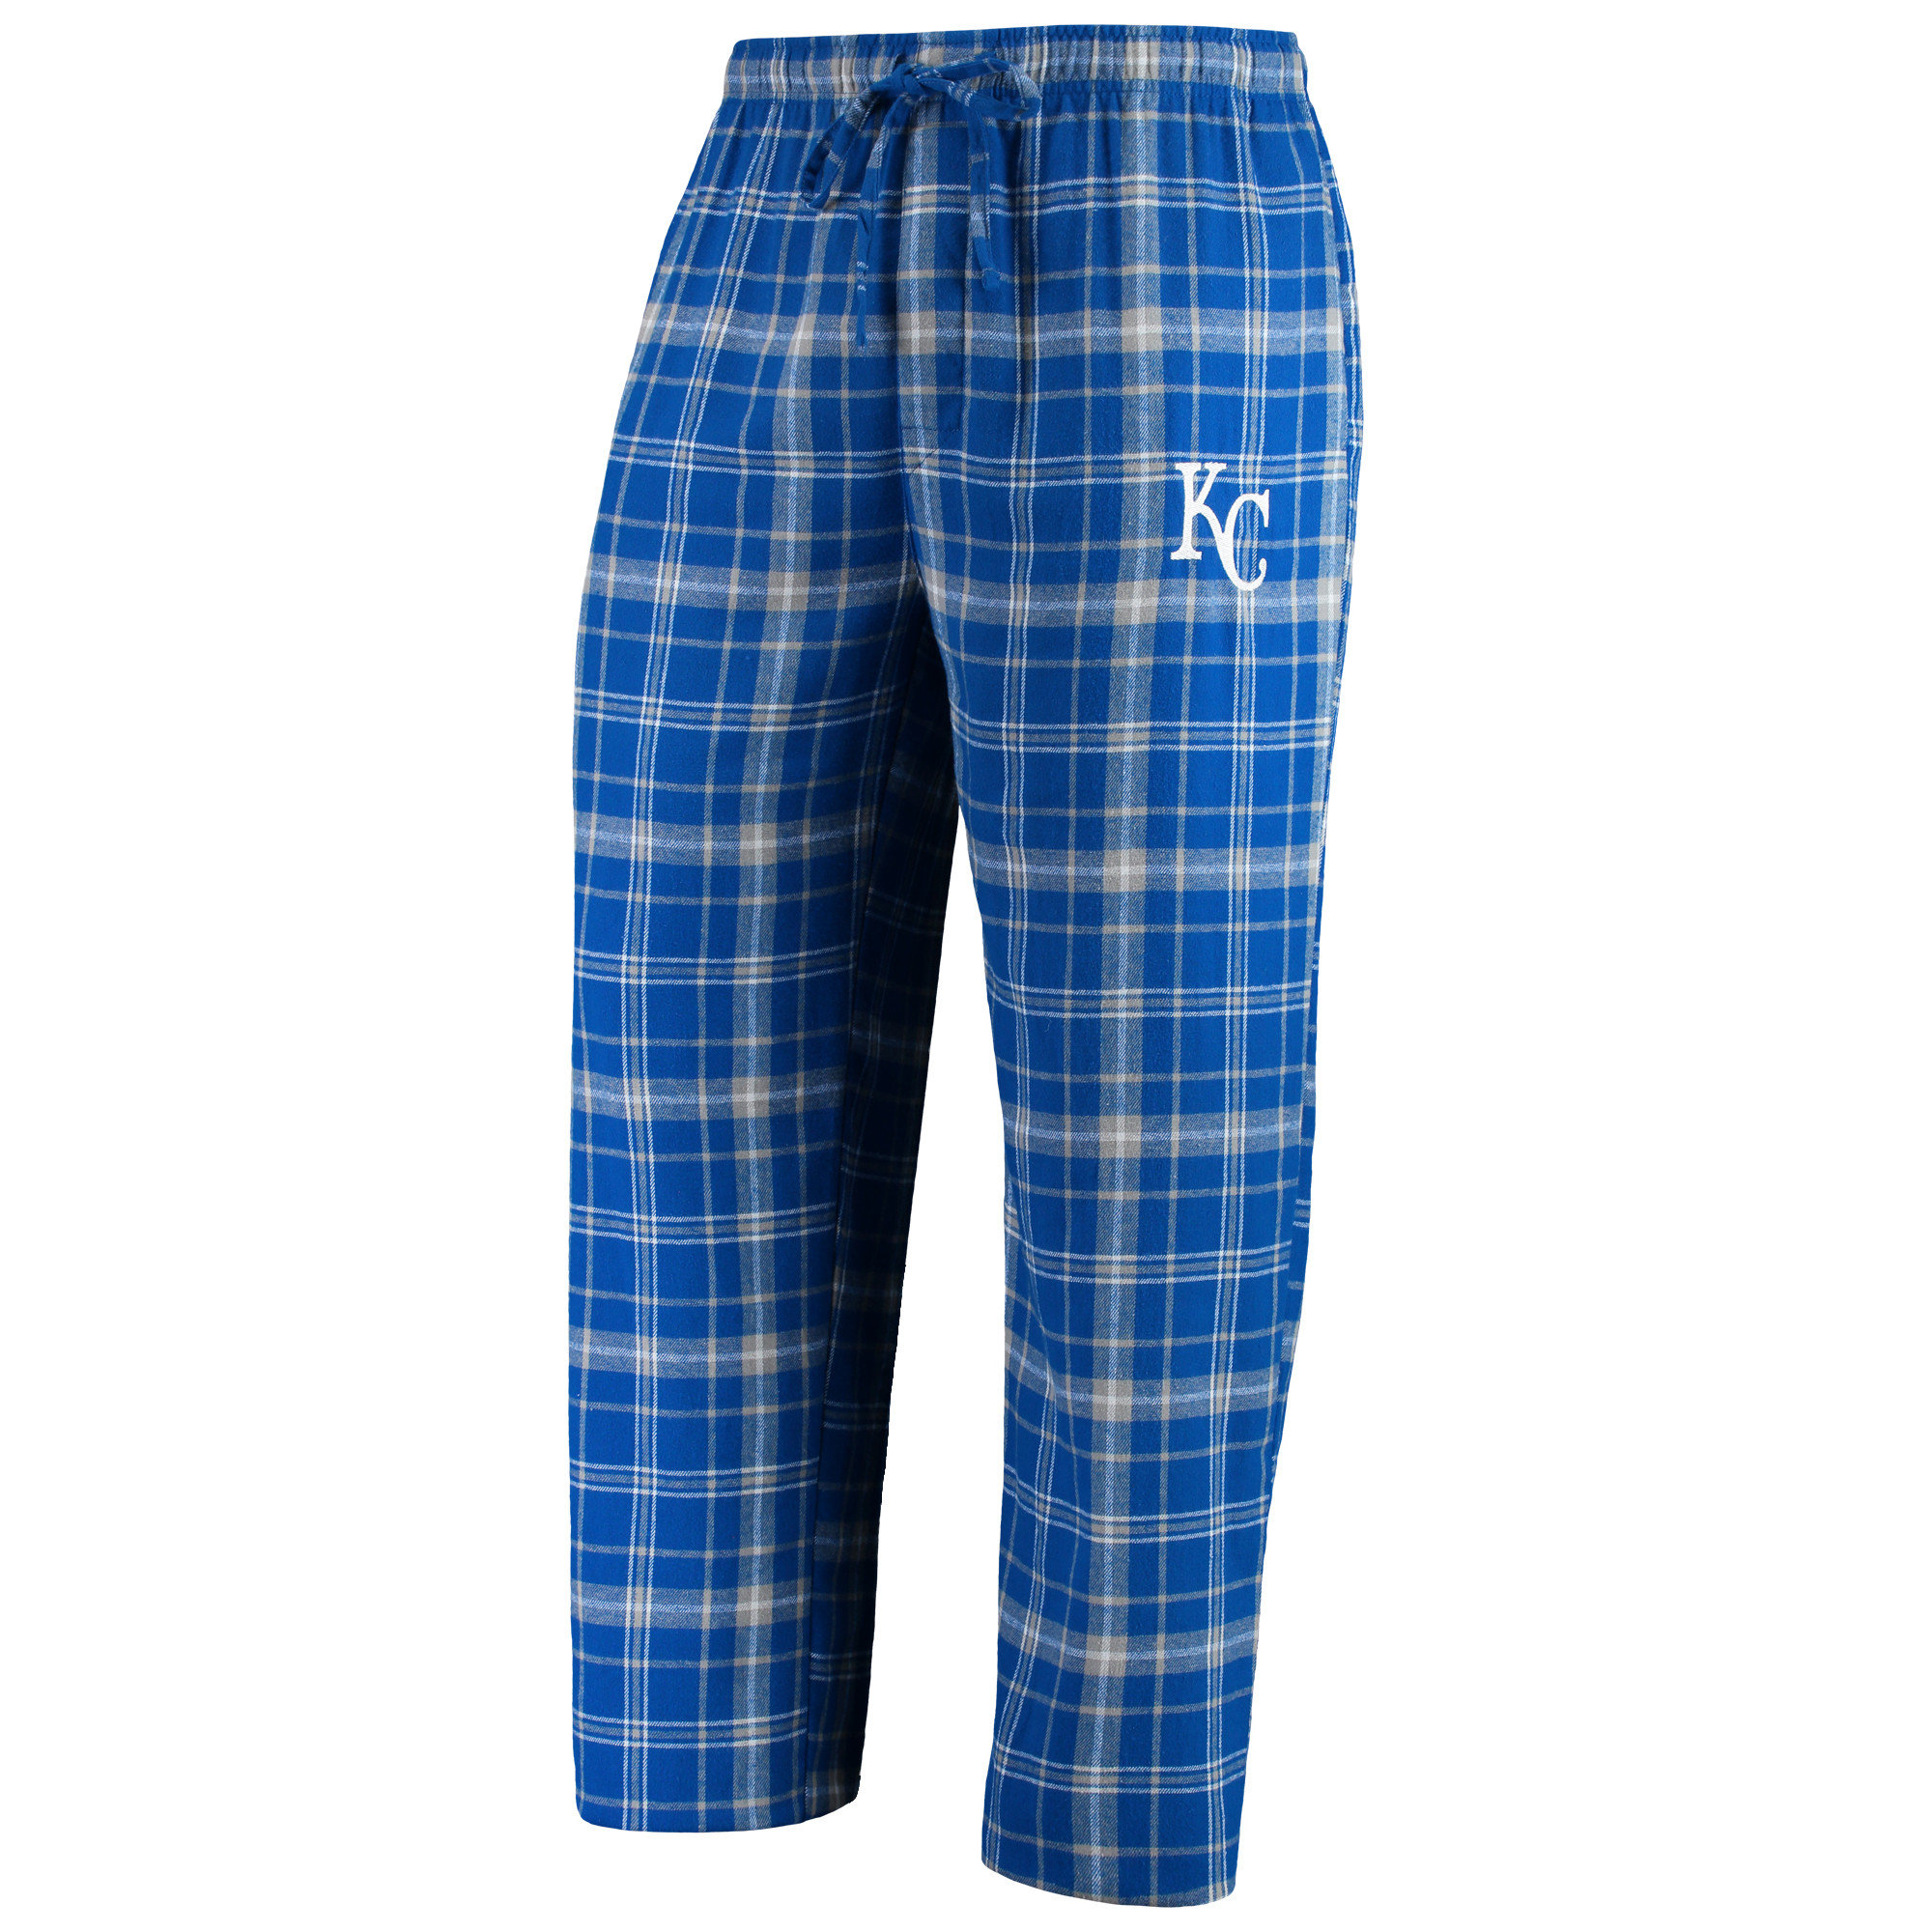 Kansas City Royals Concepts Sport Team Ultimate Plaid Flannel Pants - Royal/Gray